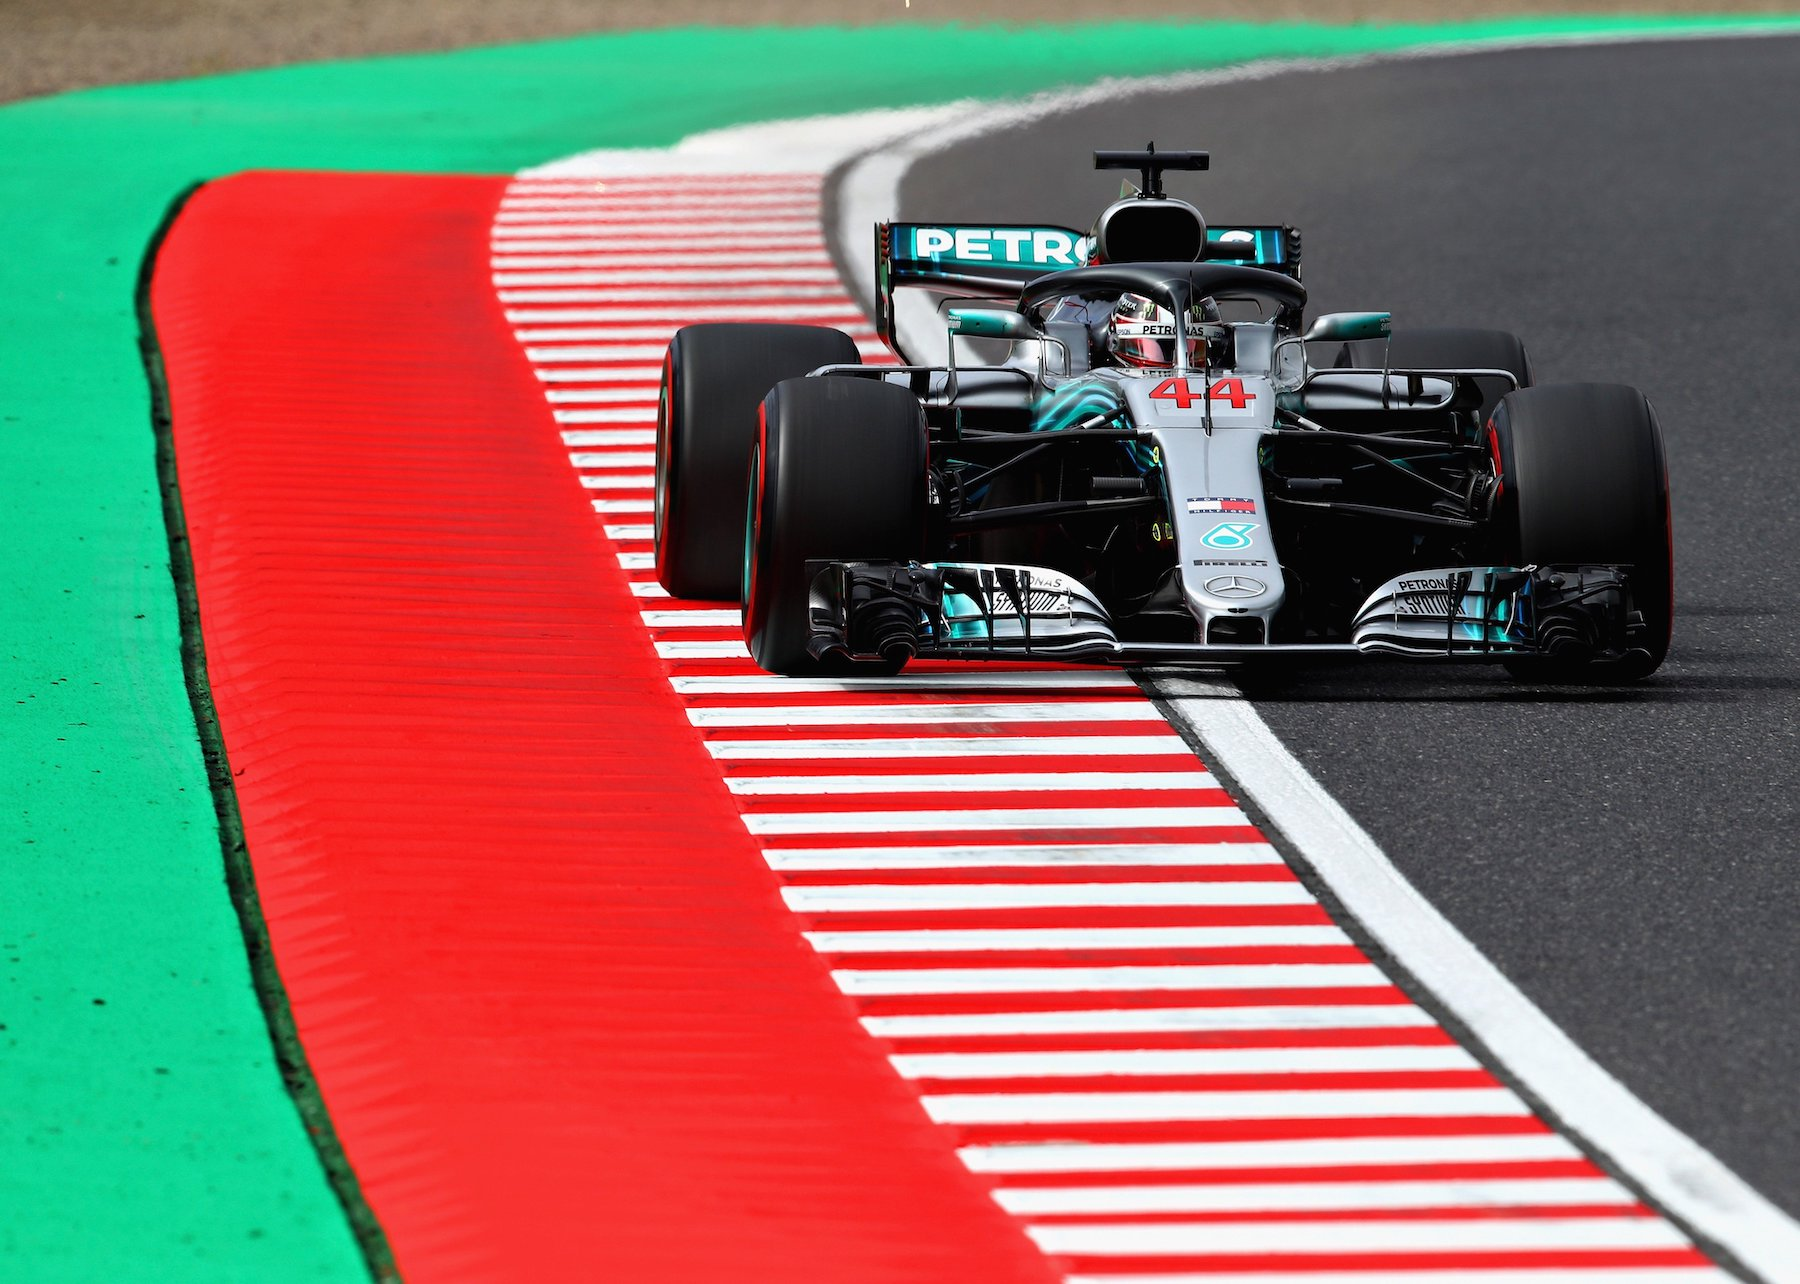 2018 Lewis Hamilton | Mercedes W09 | 2018 Japanese GP FP3 3 copy.jpg